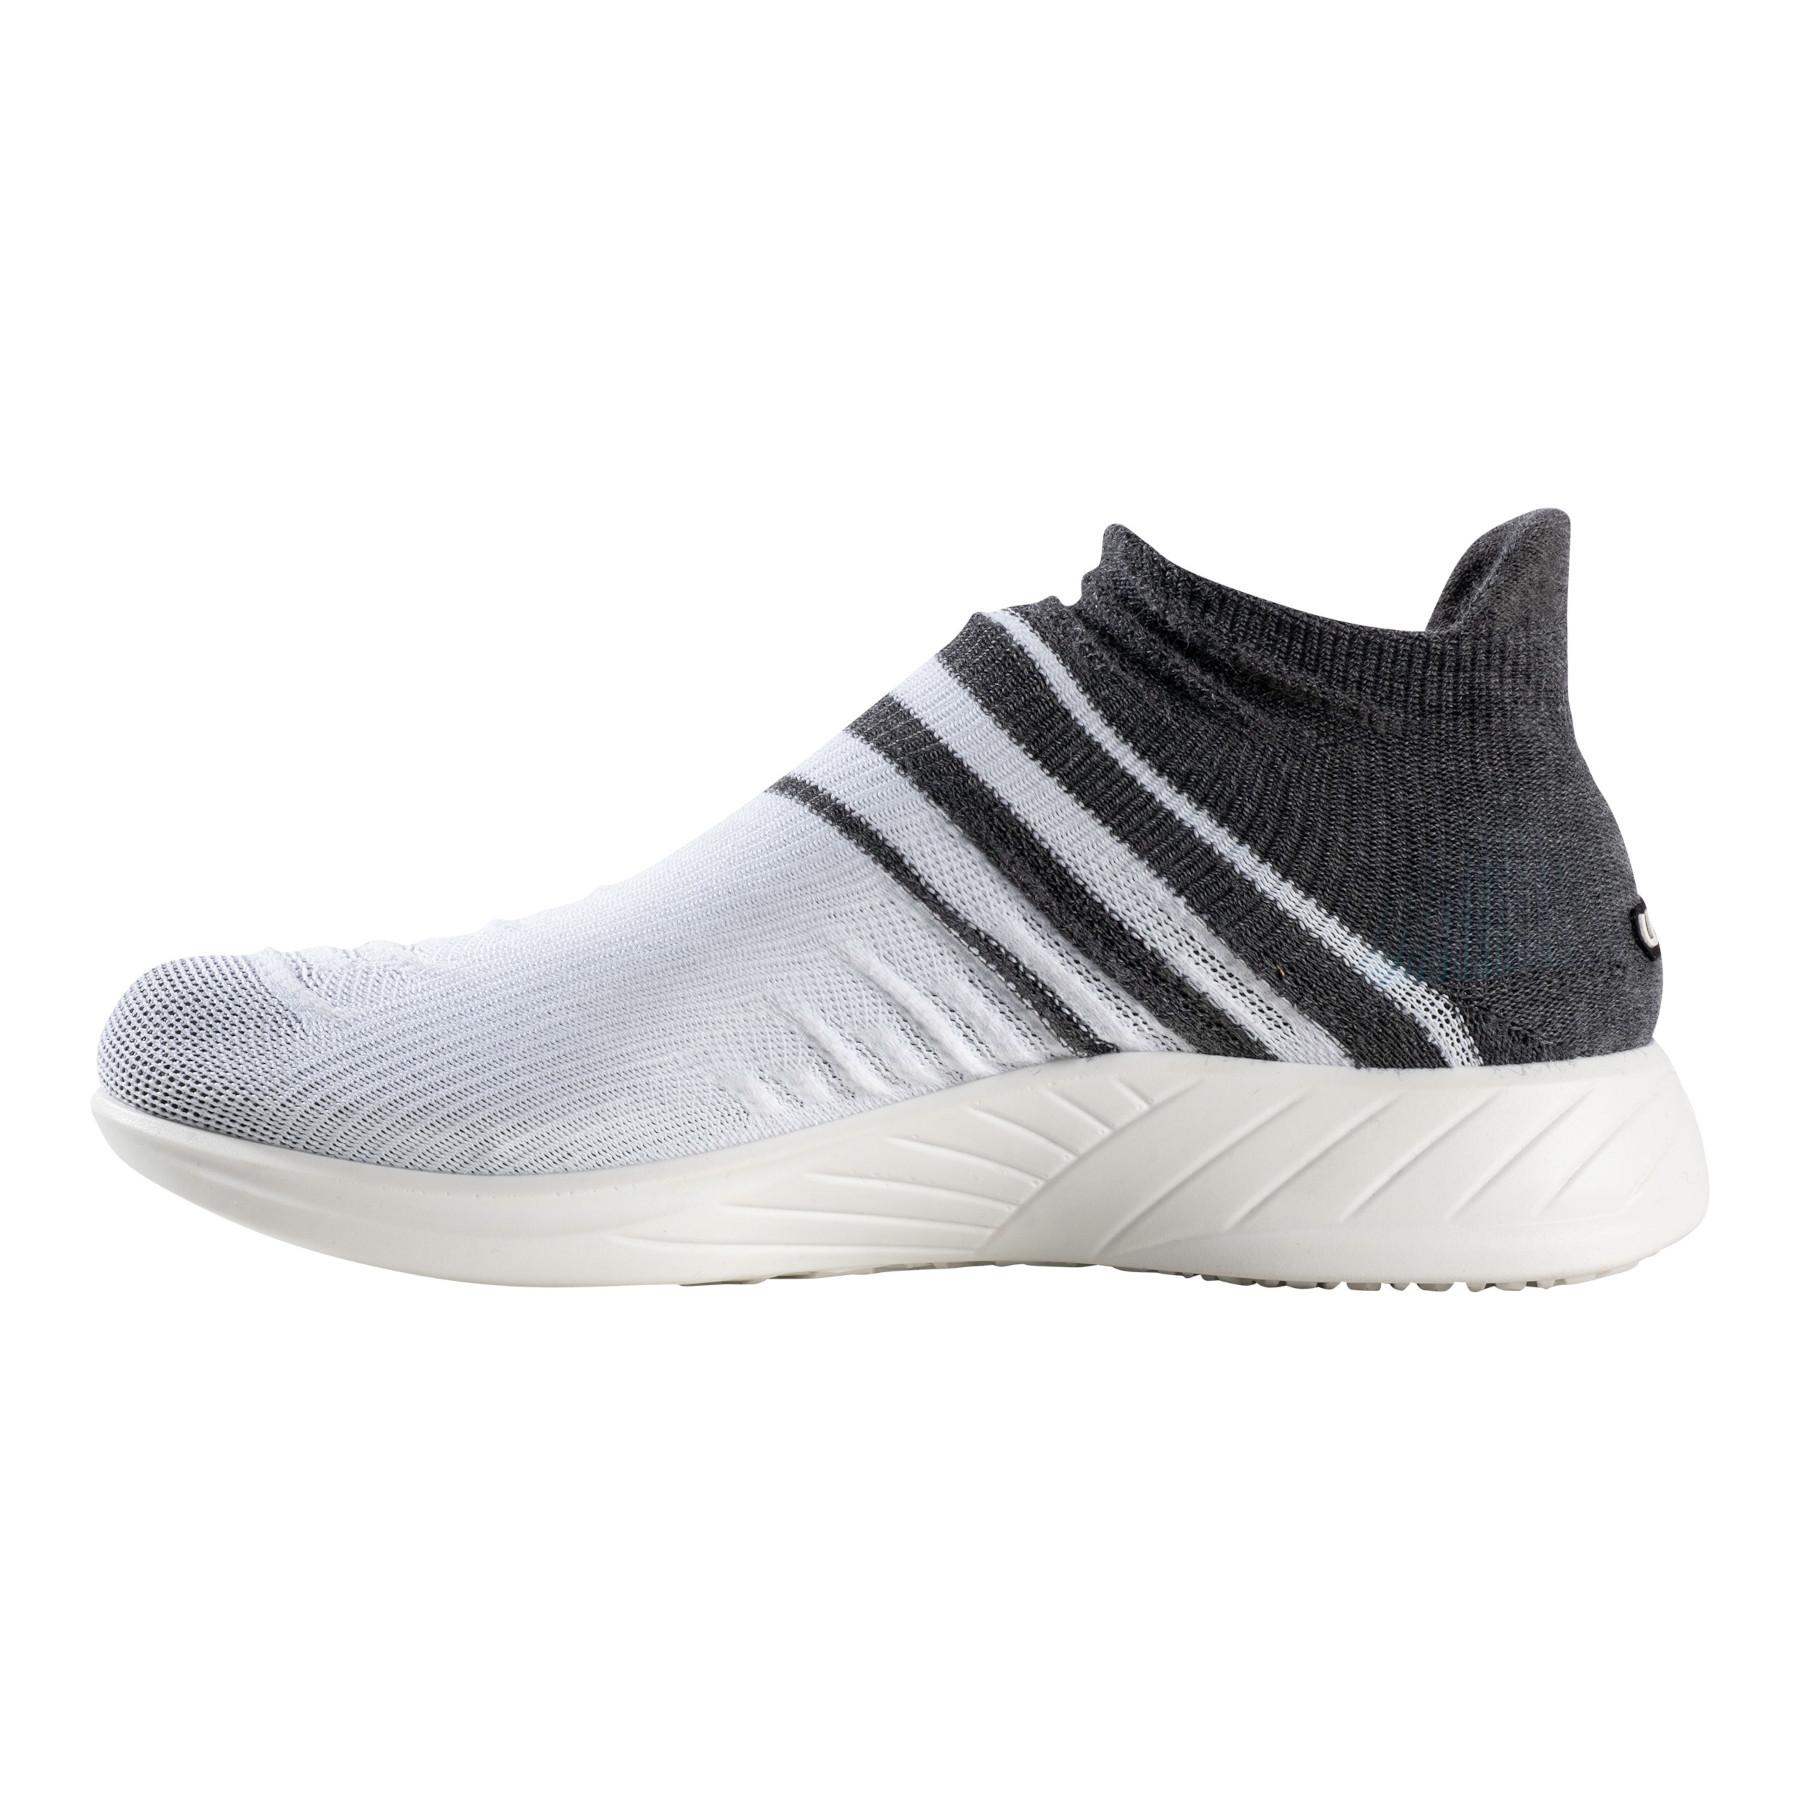 Image of UYN X-Cross Running Shoes - White/Grey